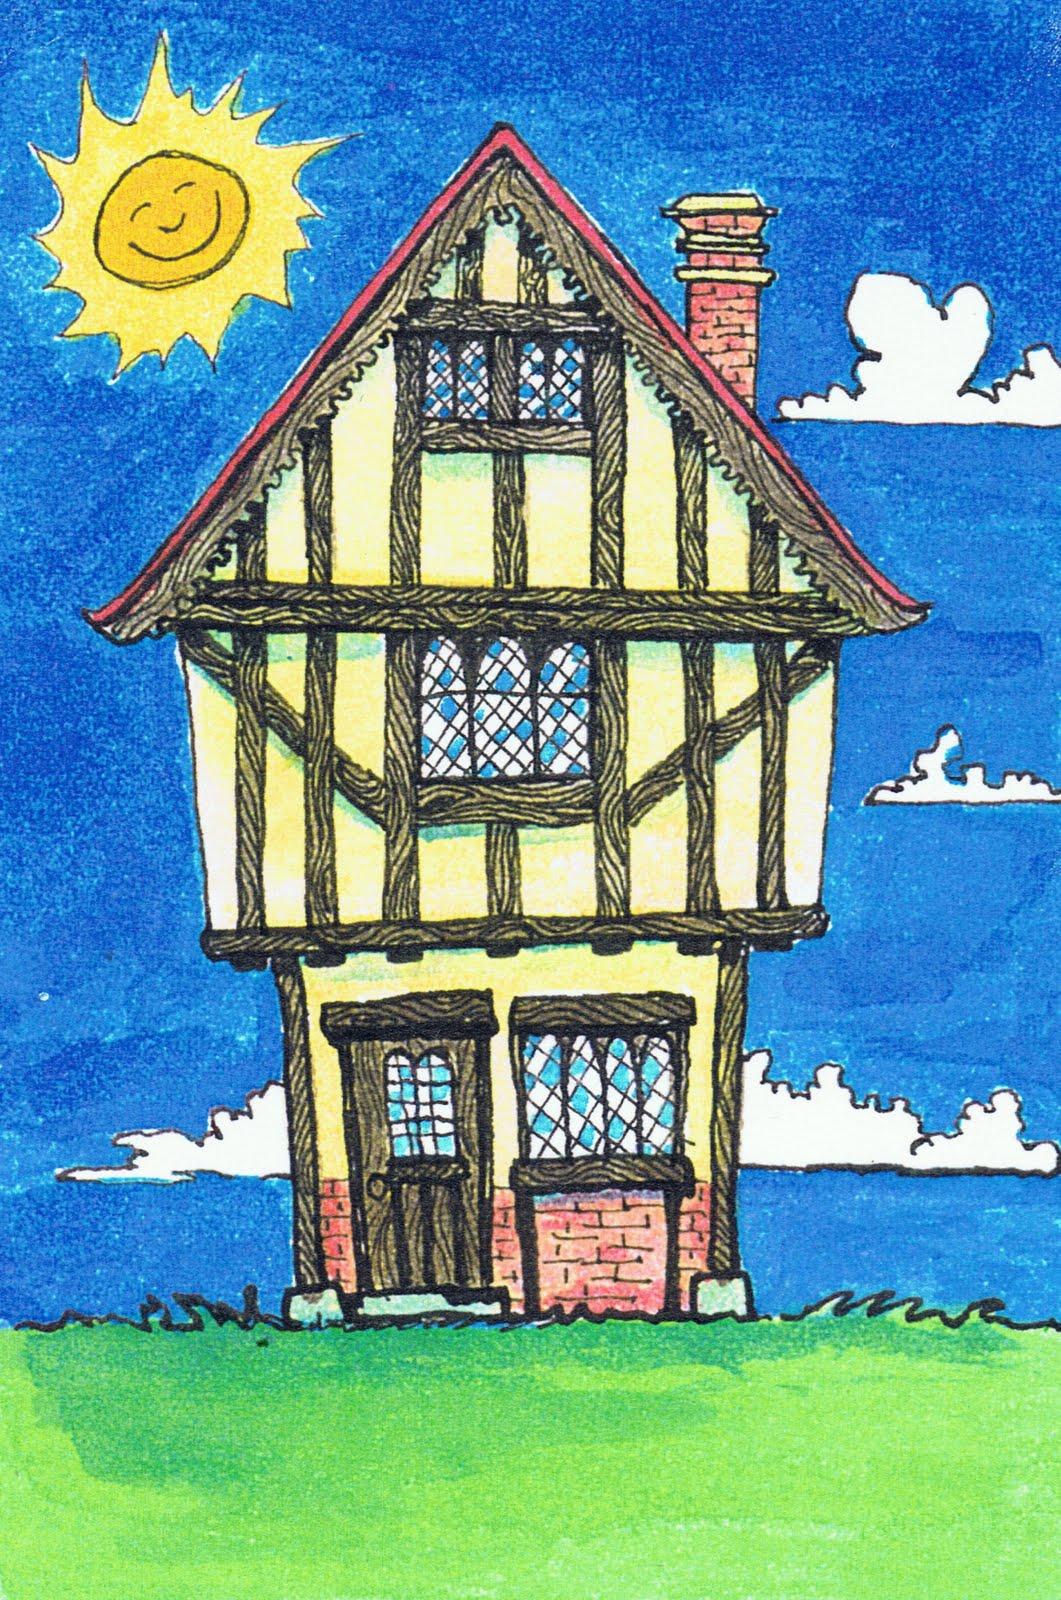 21 Tudor House Drawing Ideas That Make An Impact